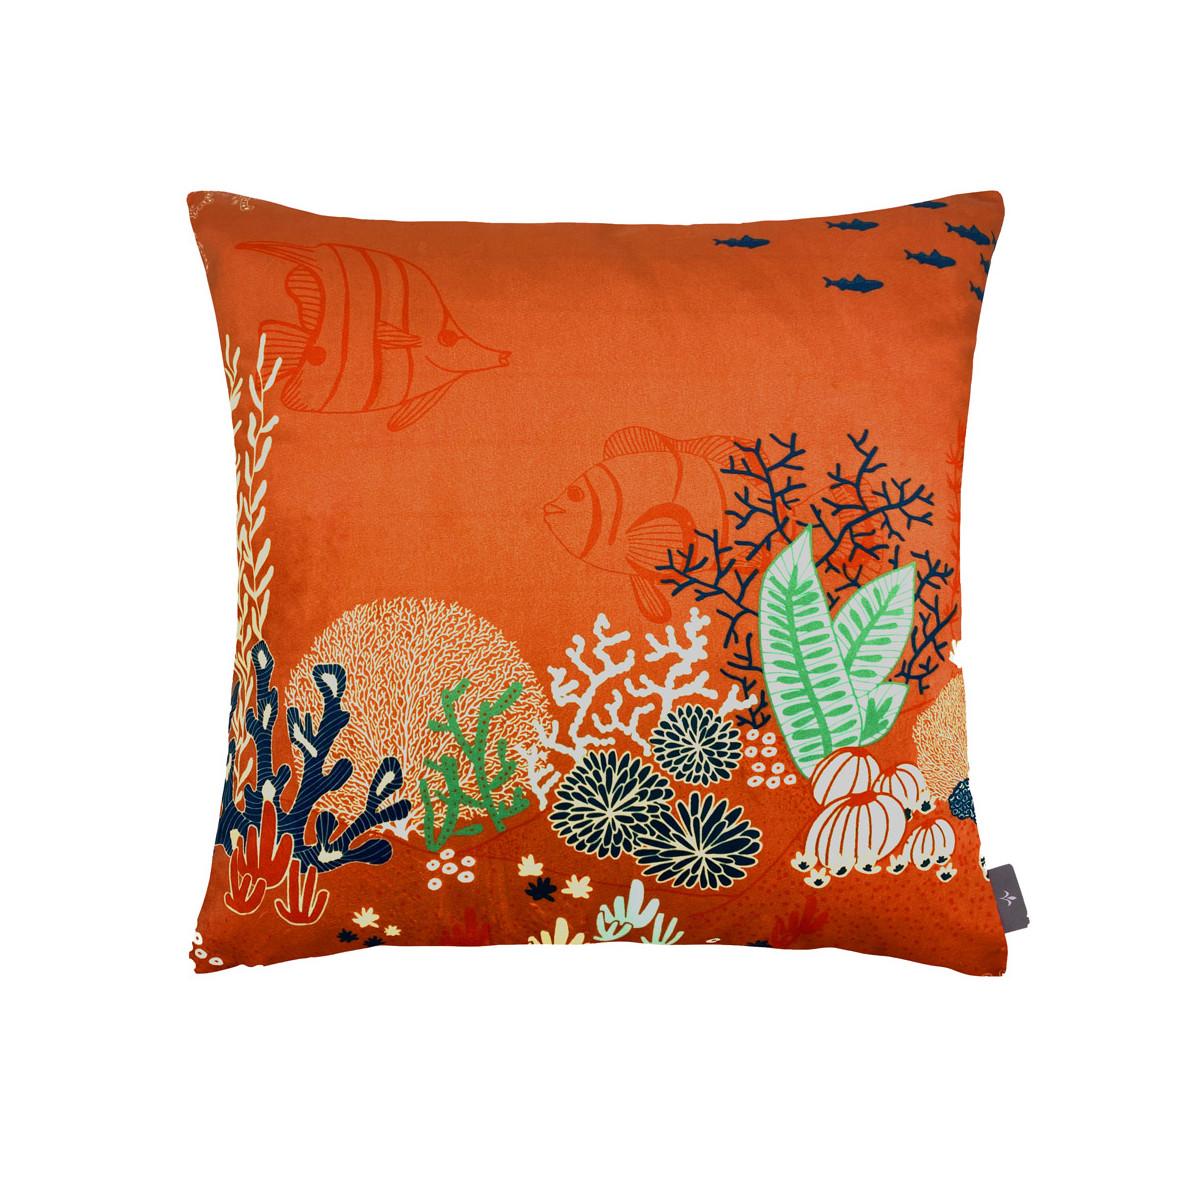 Coussin imprimé la jungle marine made in france orange 47x47